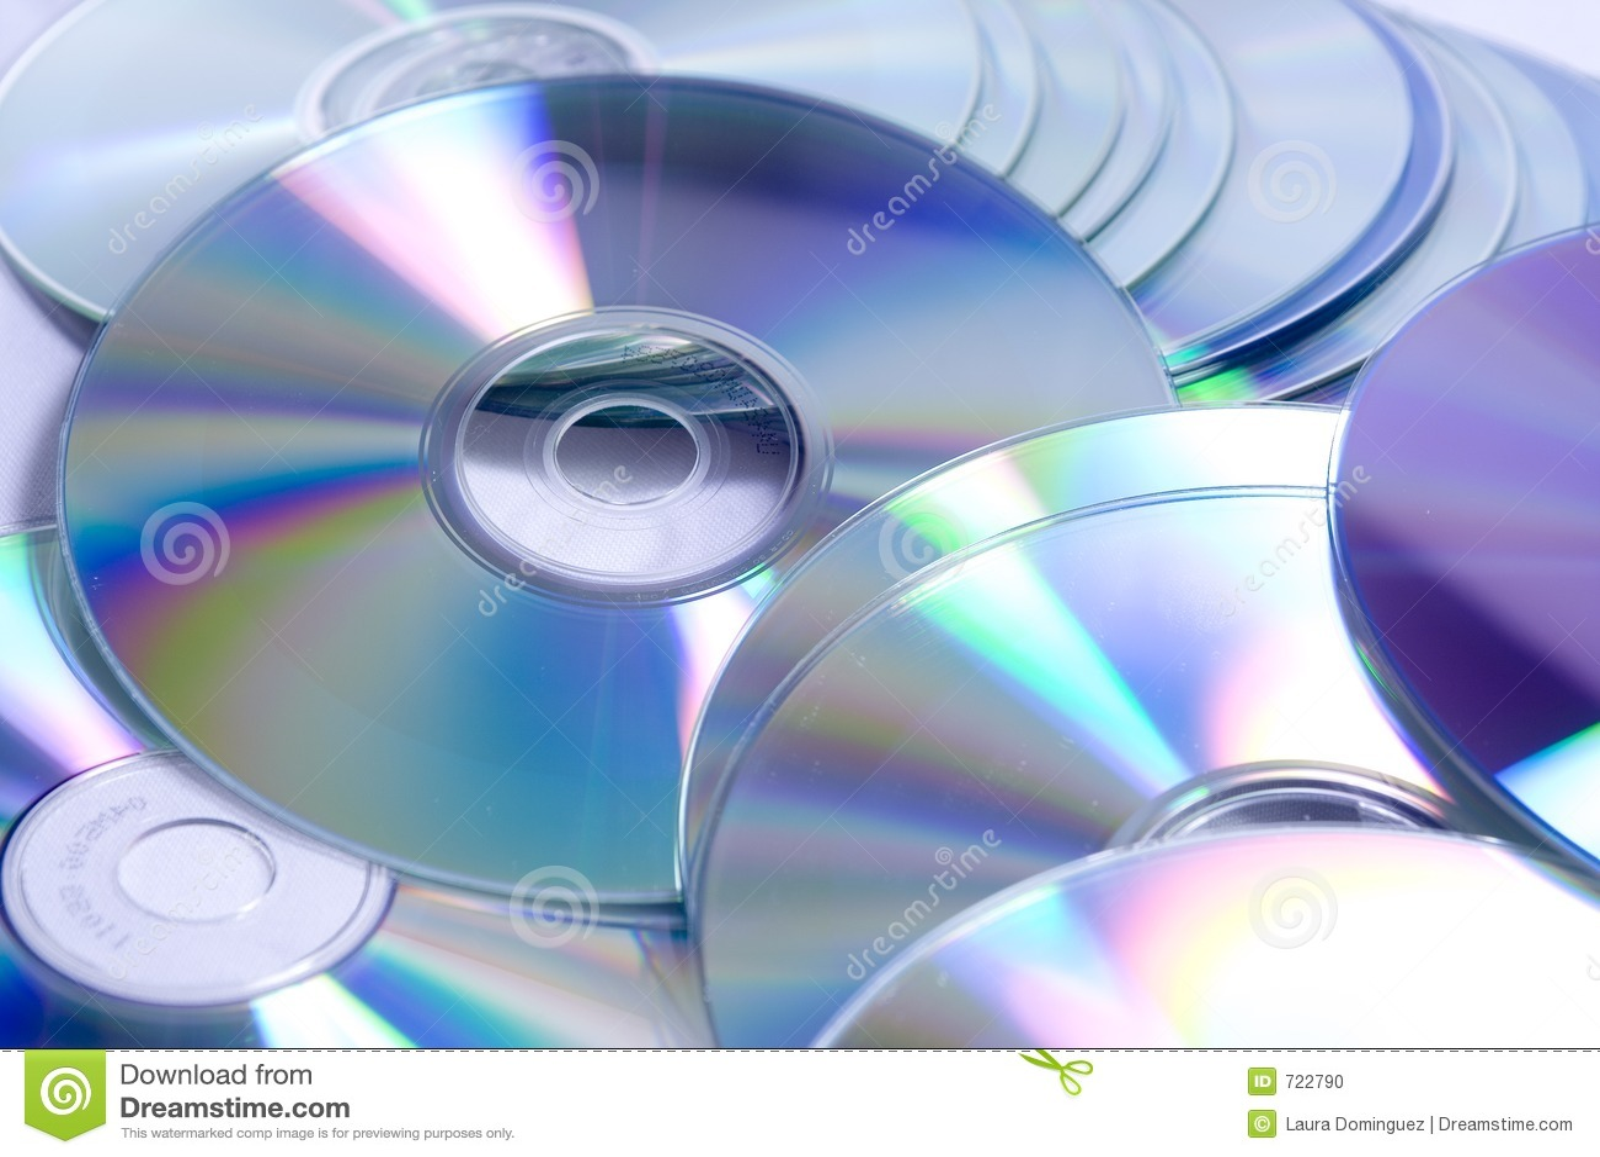 CD DVD pile